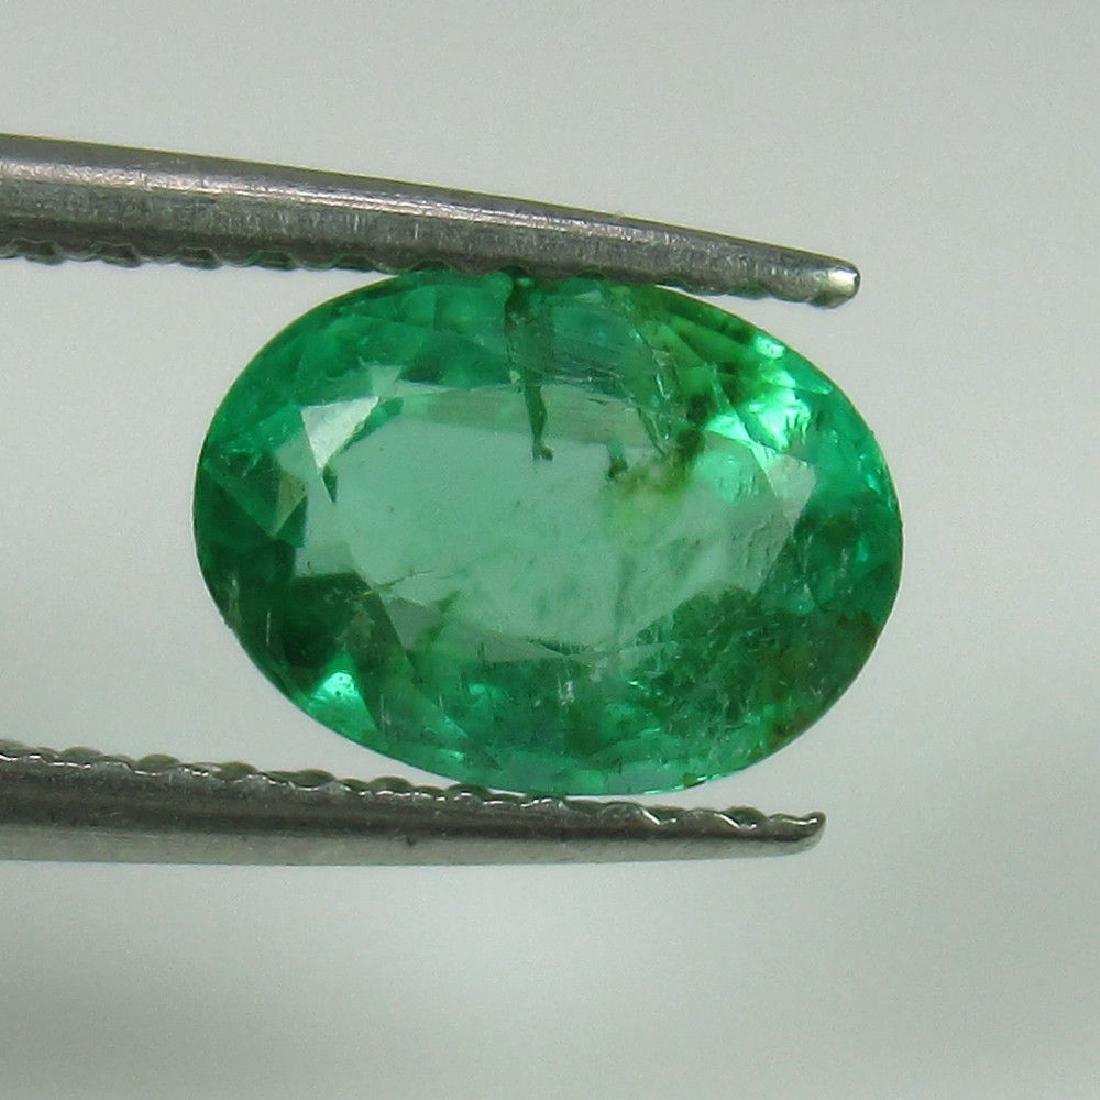 1.07 Ct Genuine Zambian Emerald Nice Oval Cut